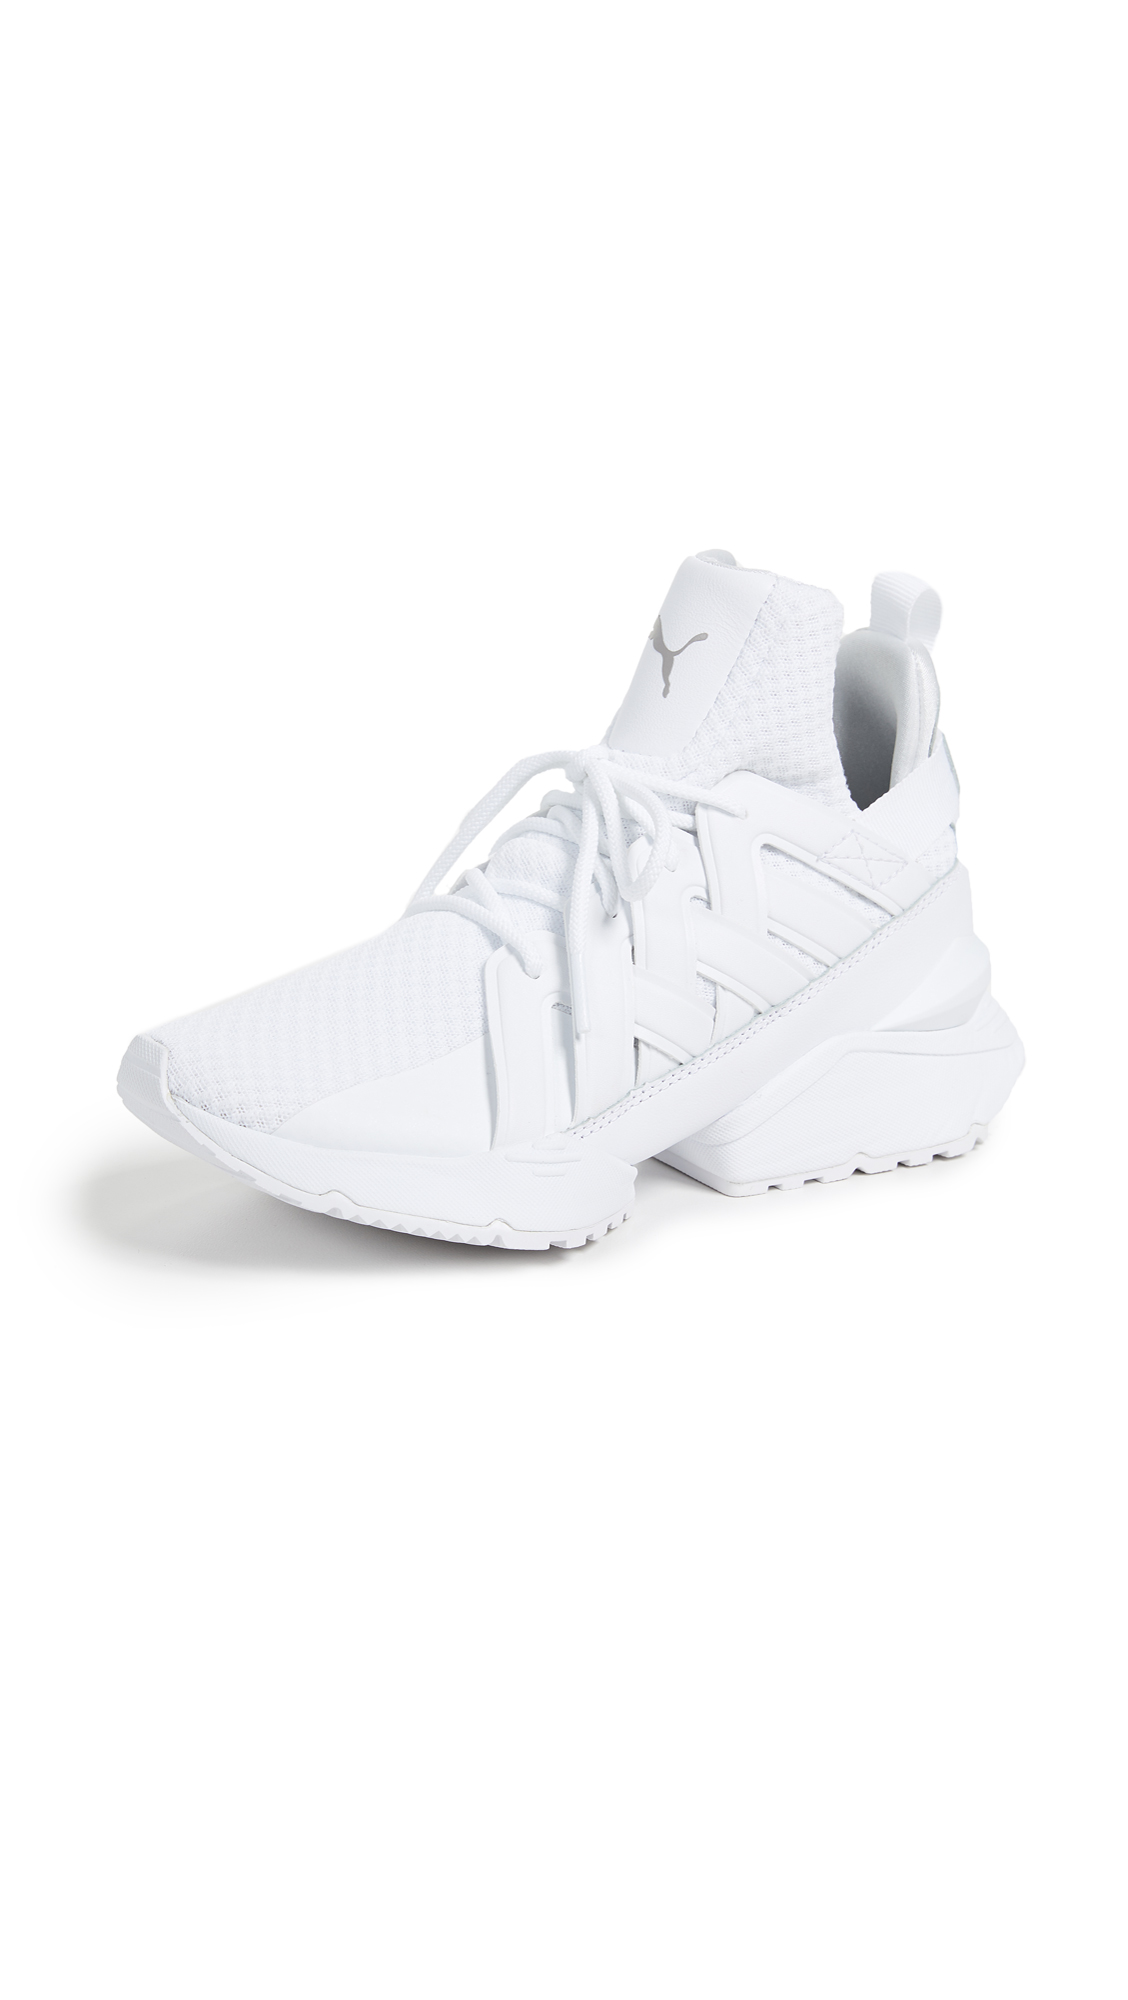 Muse White Eco-Satin Sneakers, Puma White/Puma White